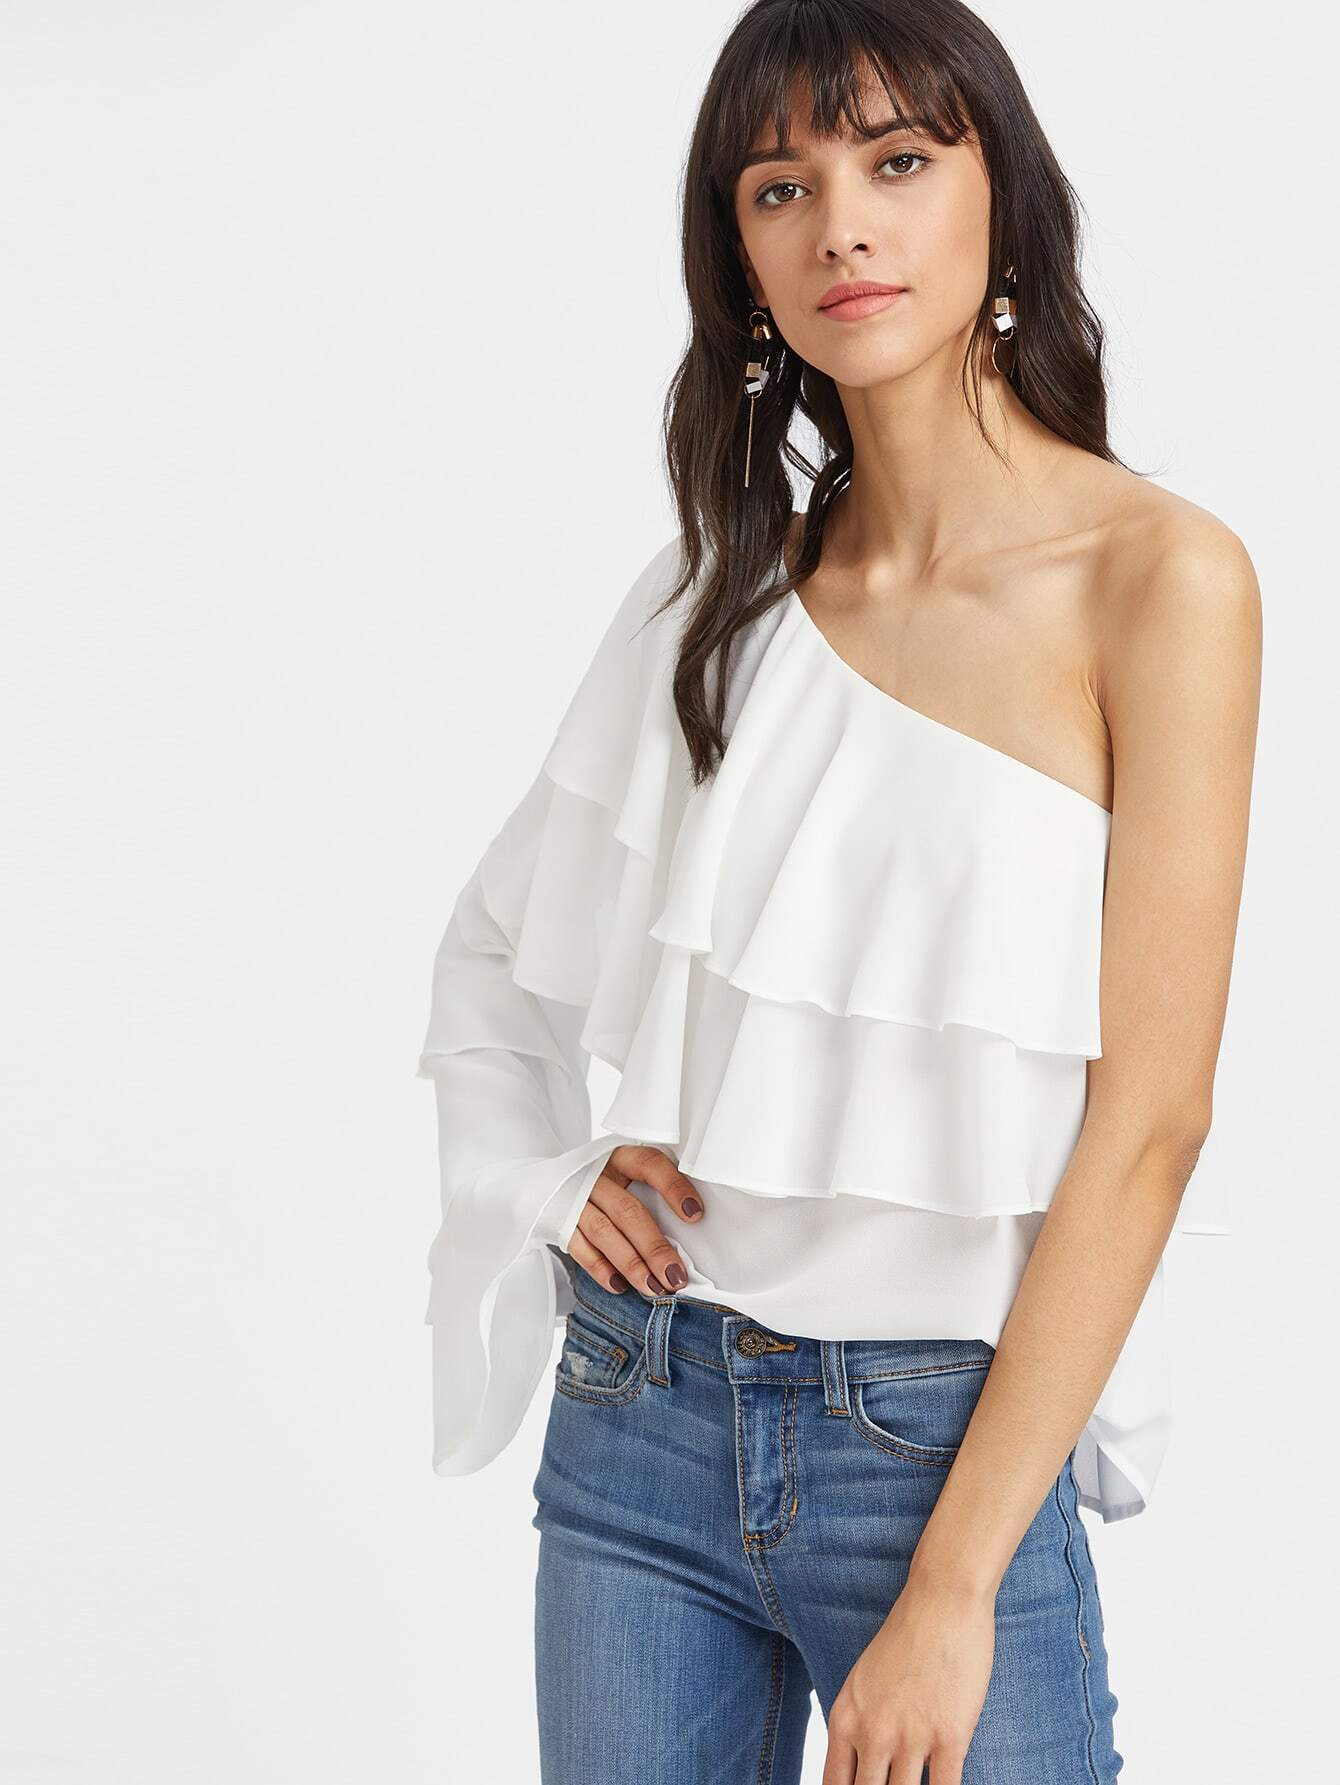 blouse170410704_2